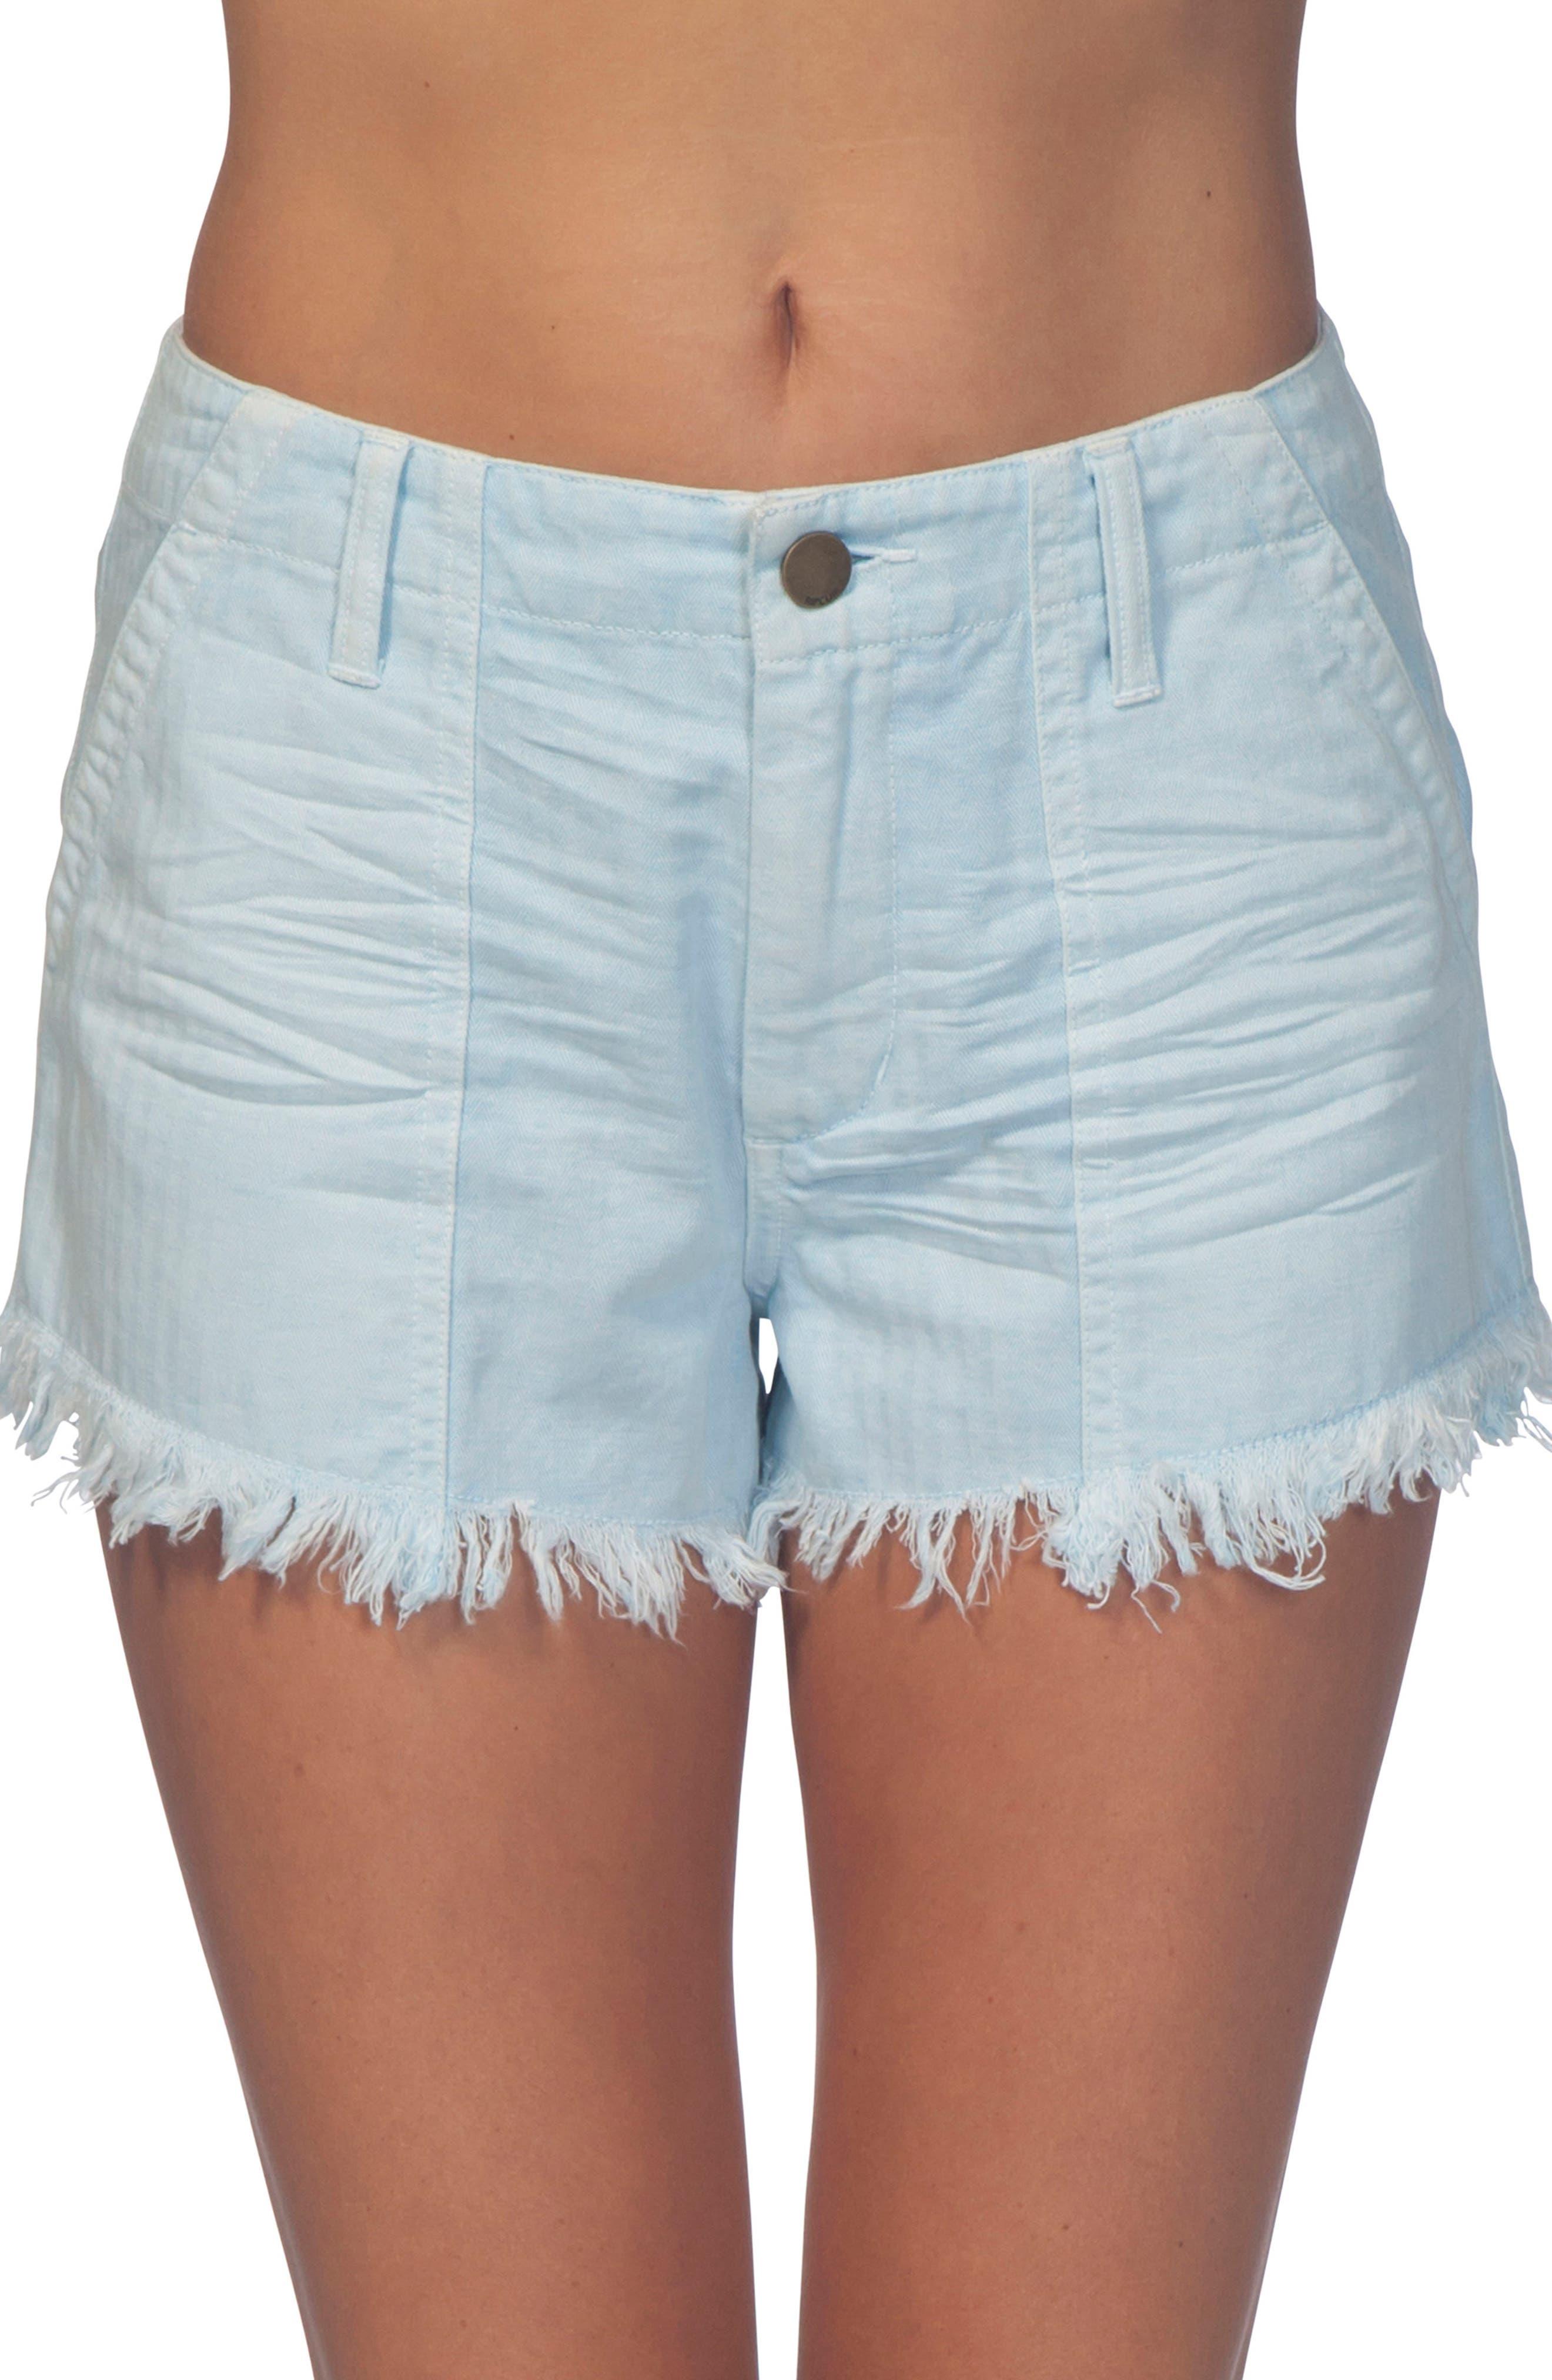 Vista Cutoff Denim Shorts,                             Main thumbnail 1, color,                             Light Blue